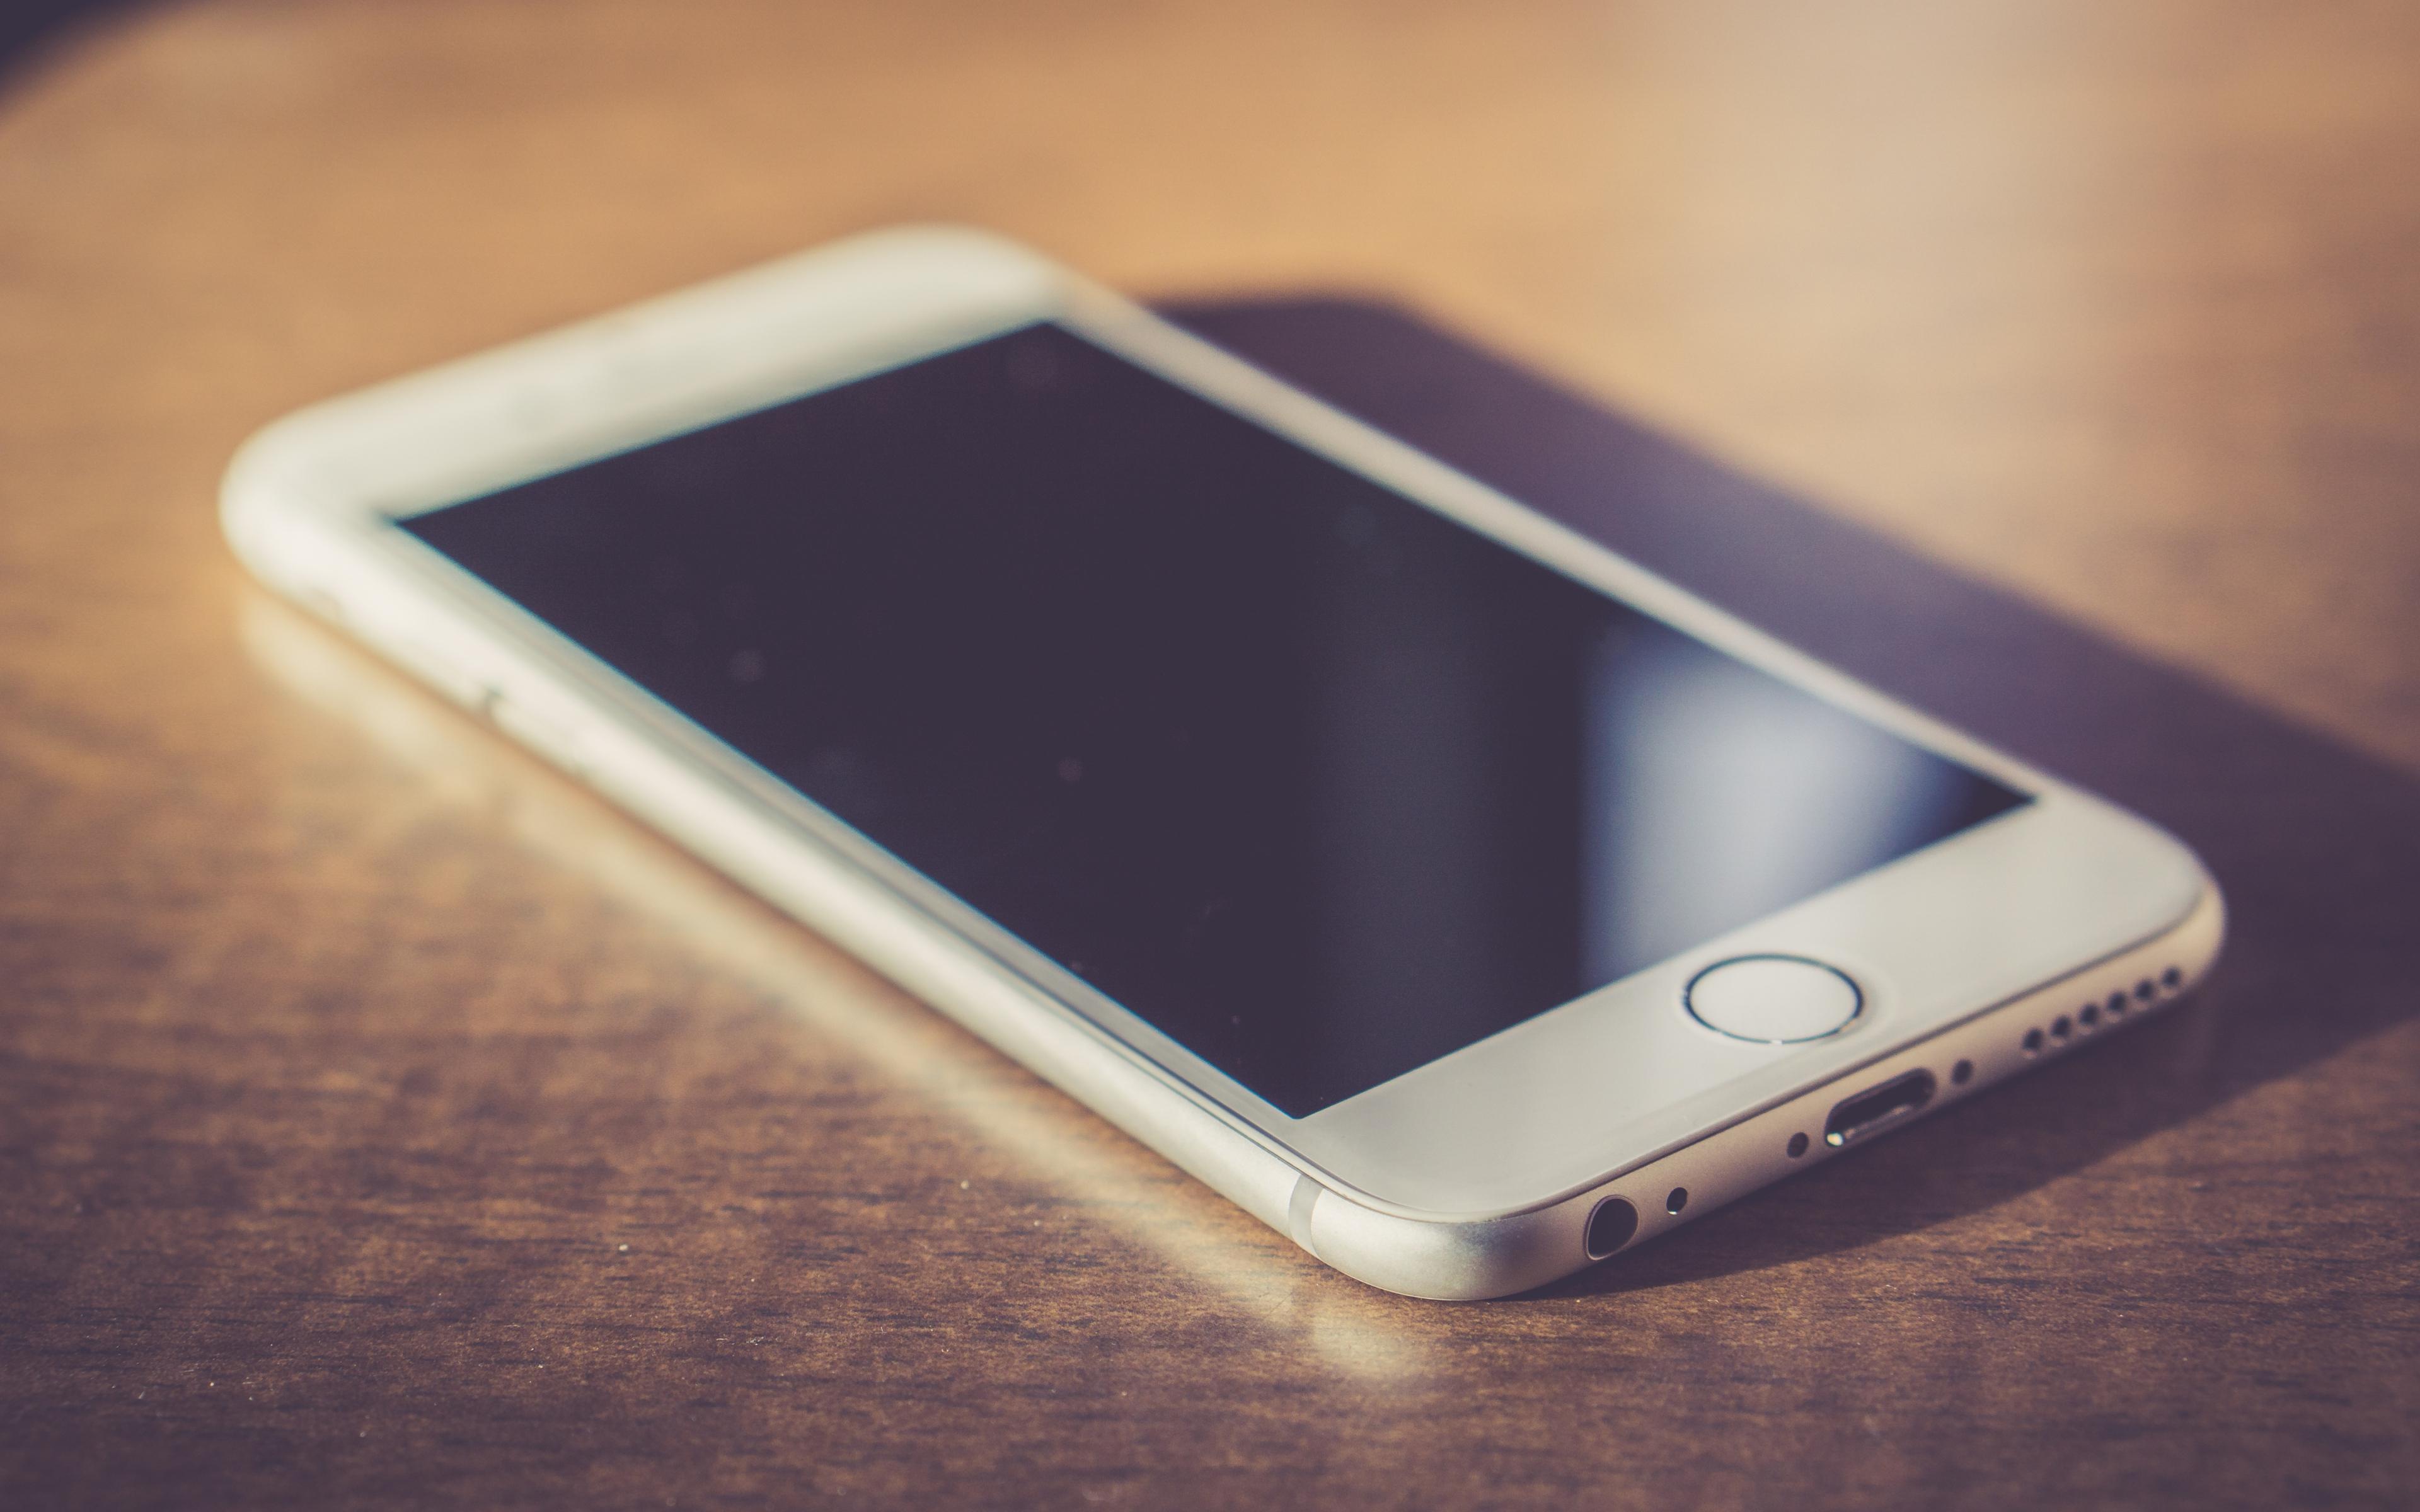 iphone iphone 6 apple 3840x2400